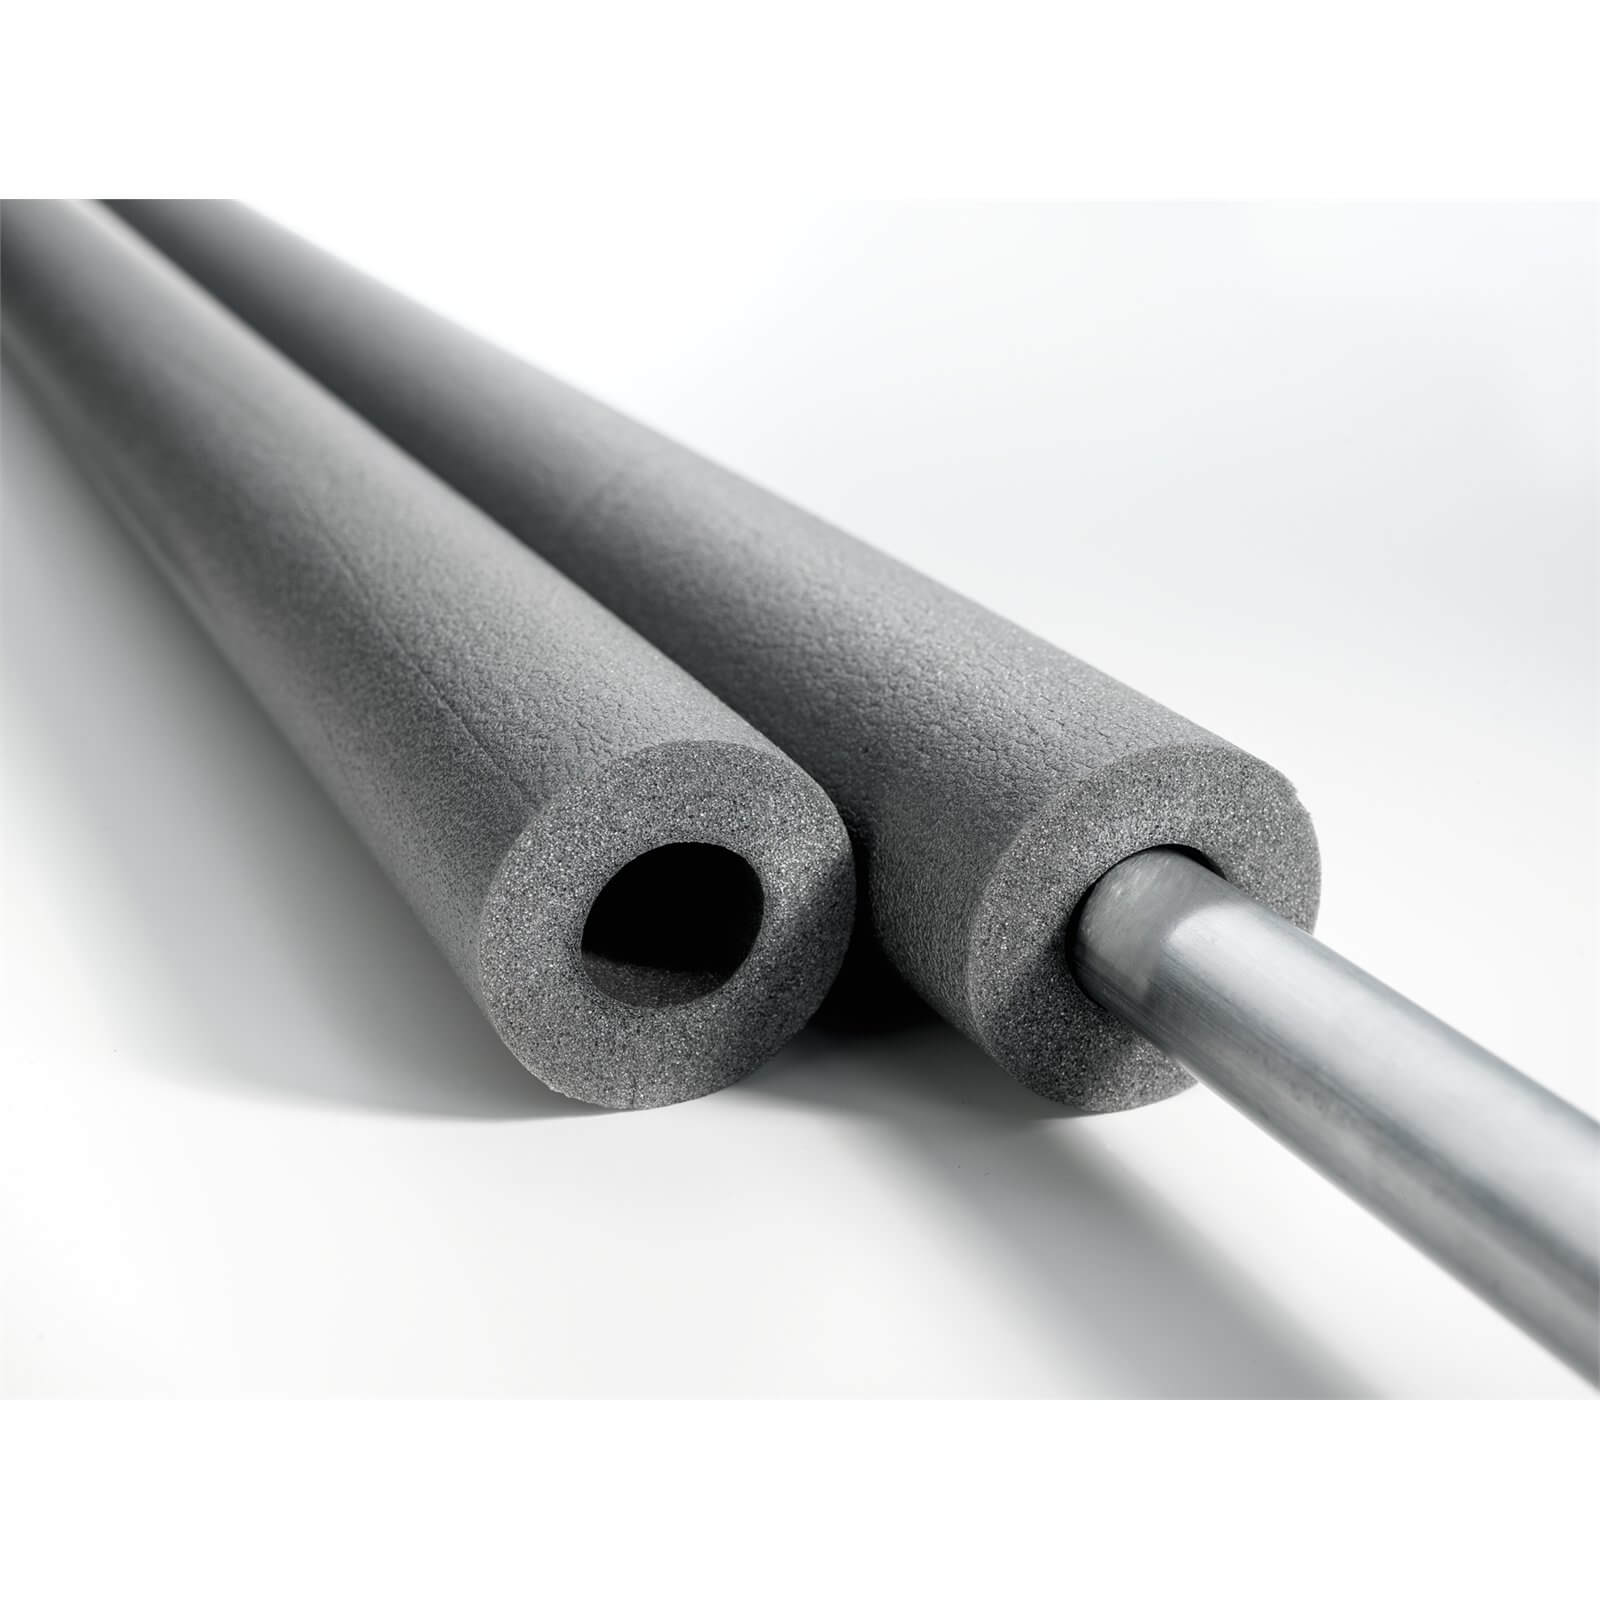 Climaflex 25mm Polyethylene Pipe Insulation - 15mm x 1m